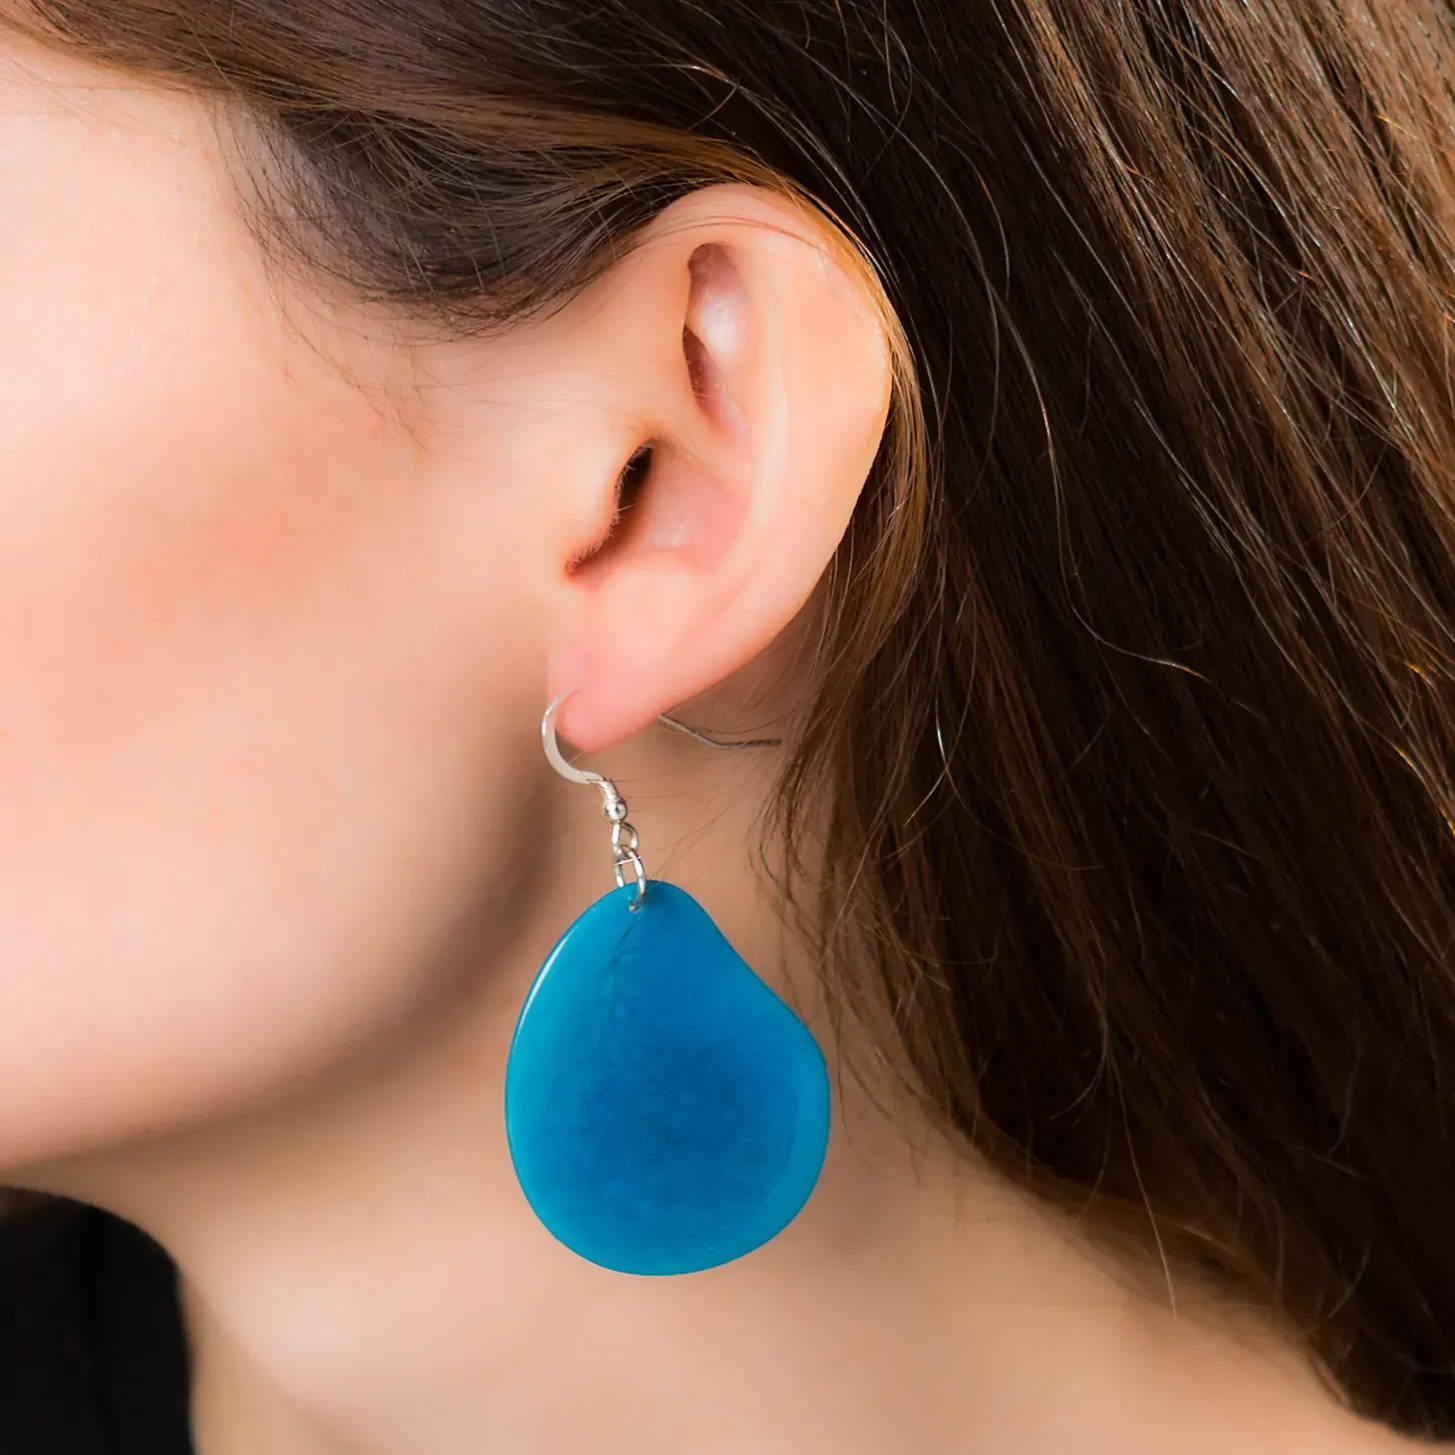 Blue tagua nut sliced earring